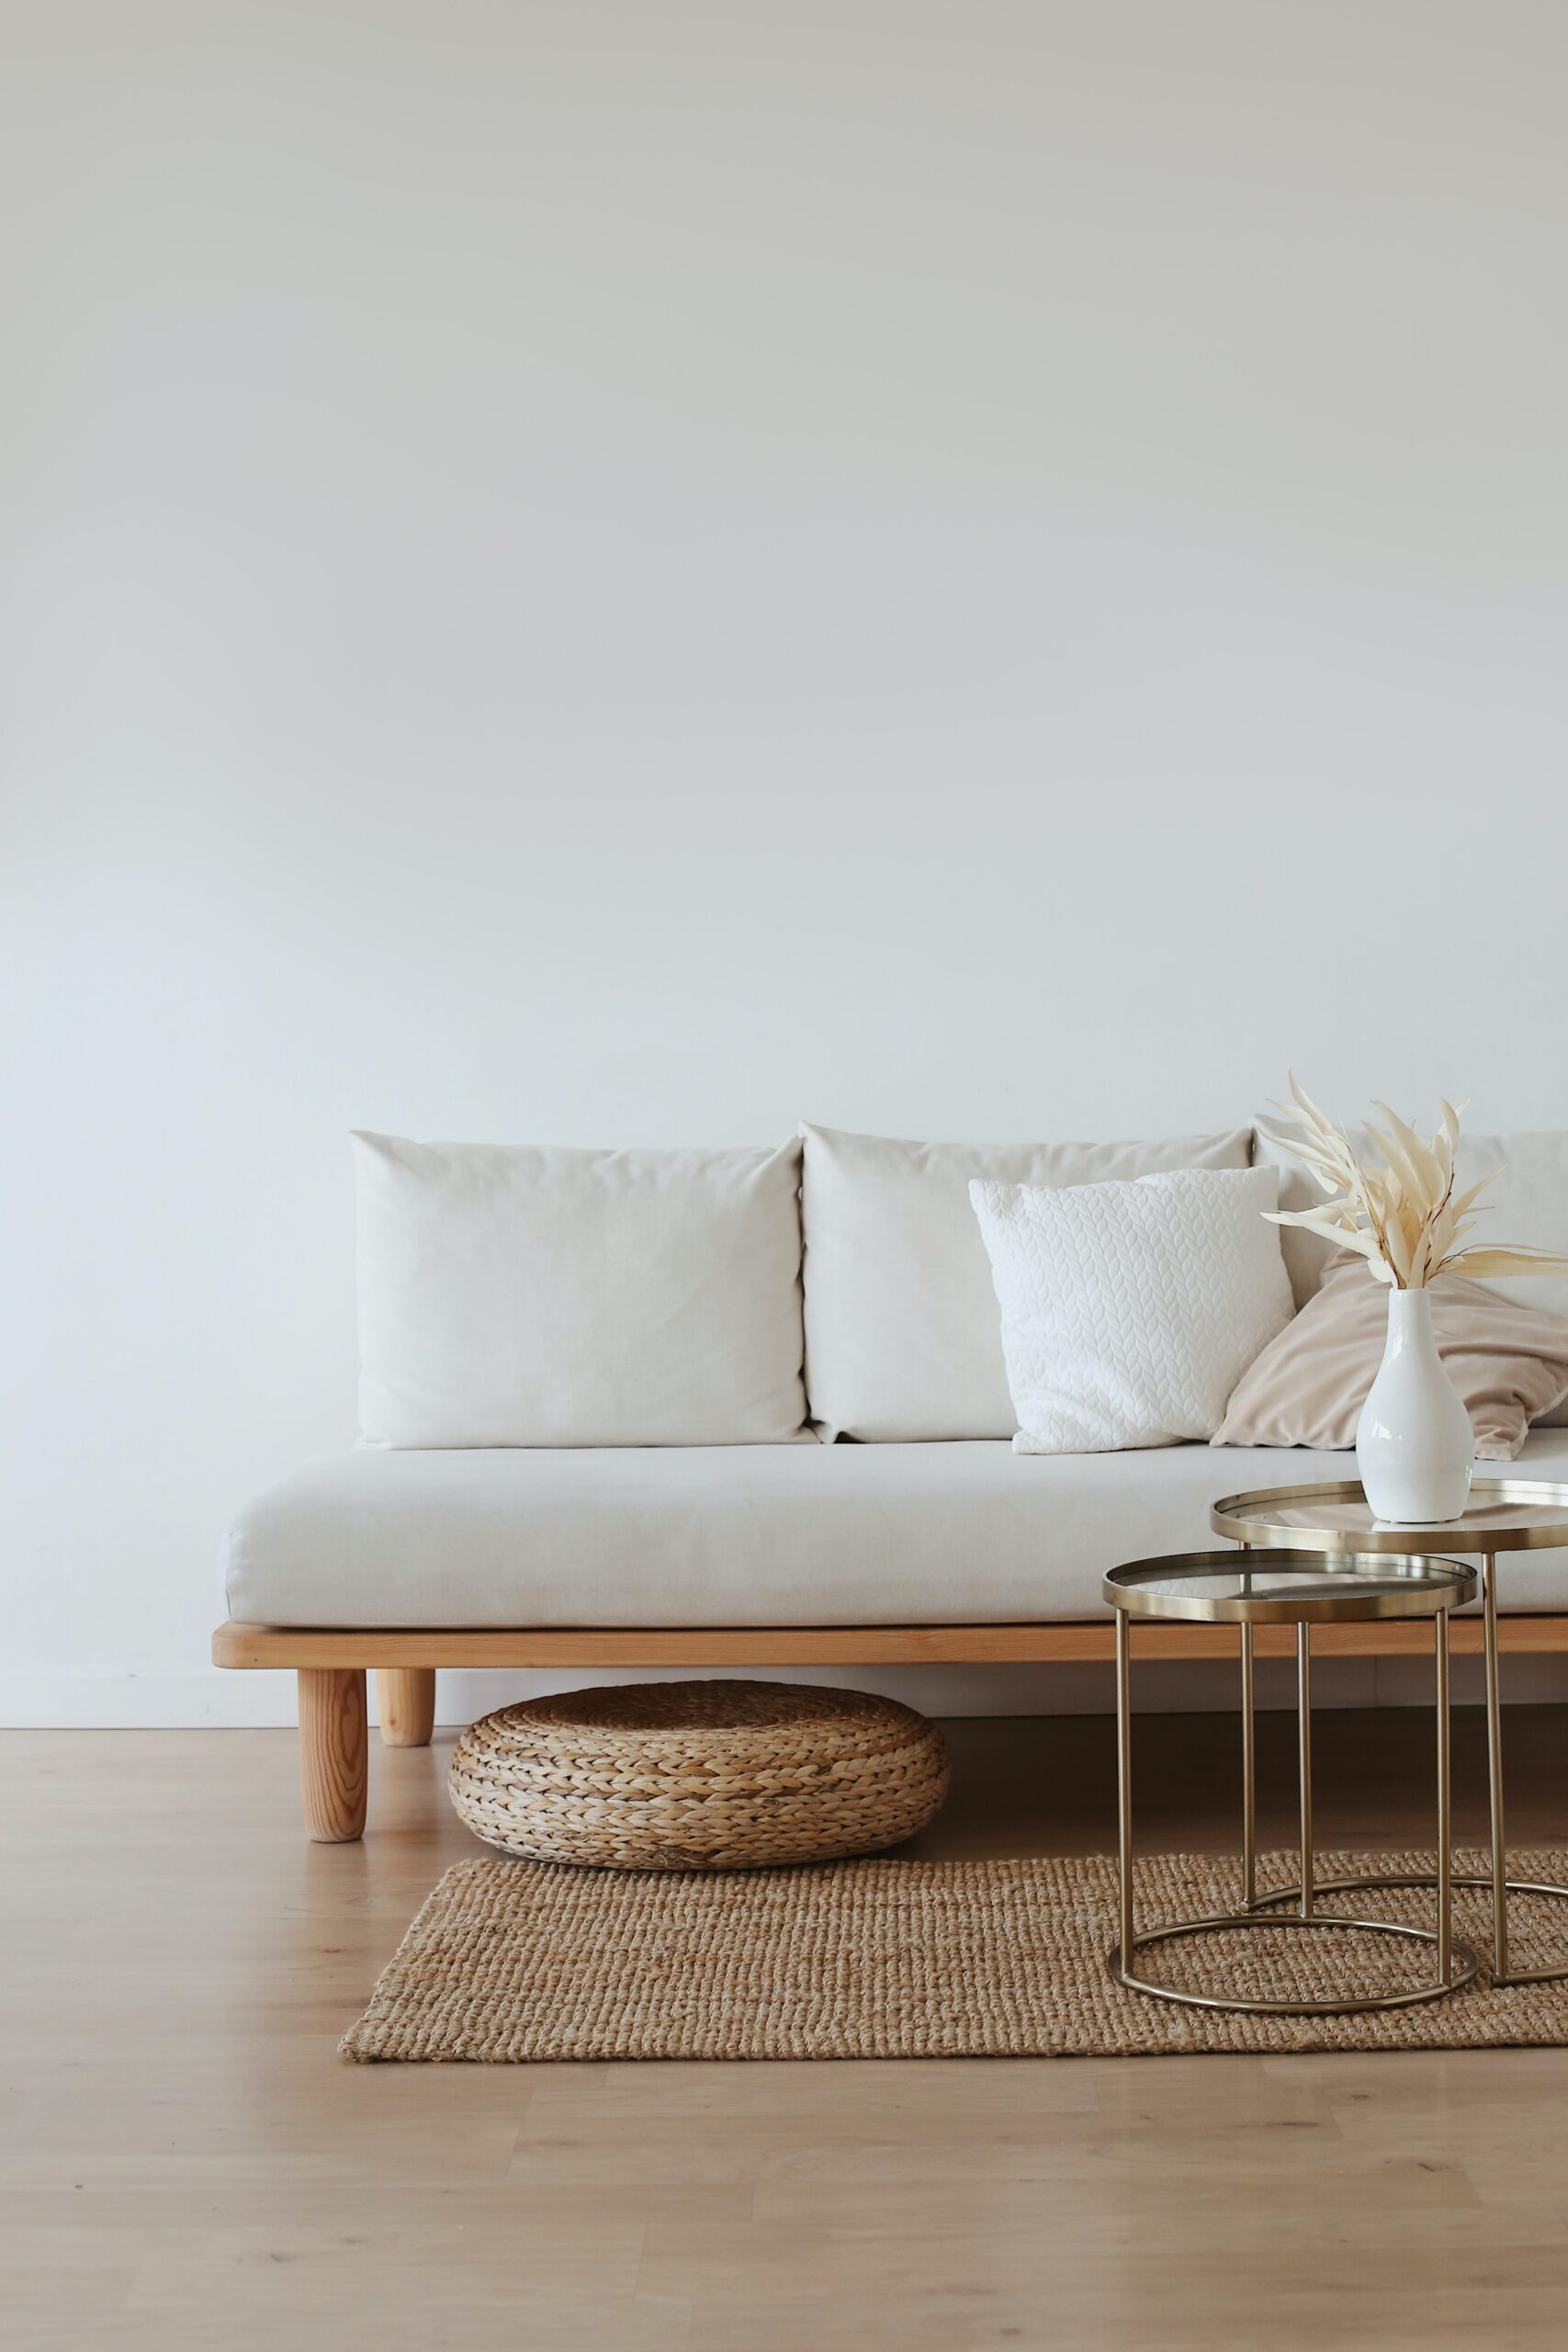 Luxe Minimalism Home Design